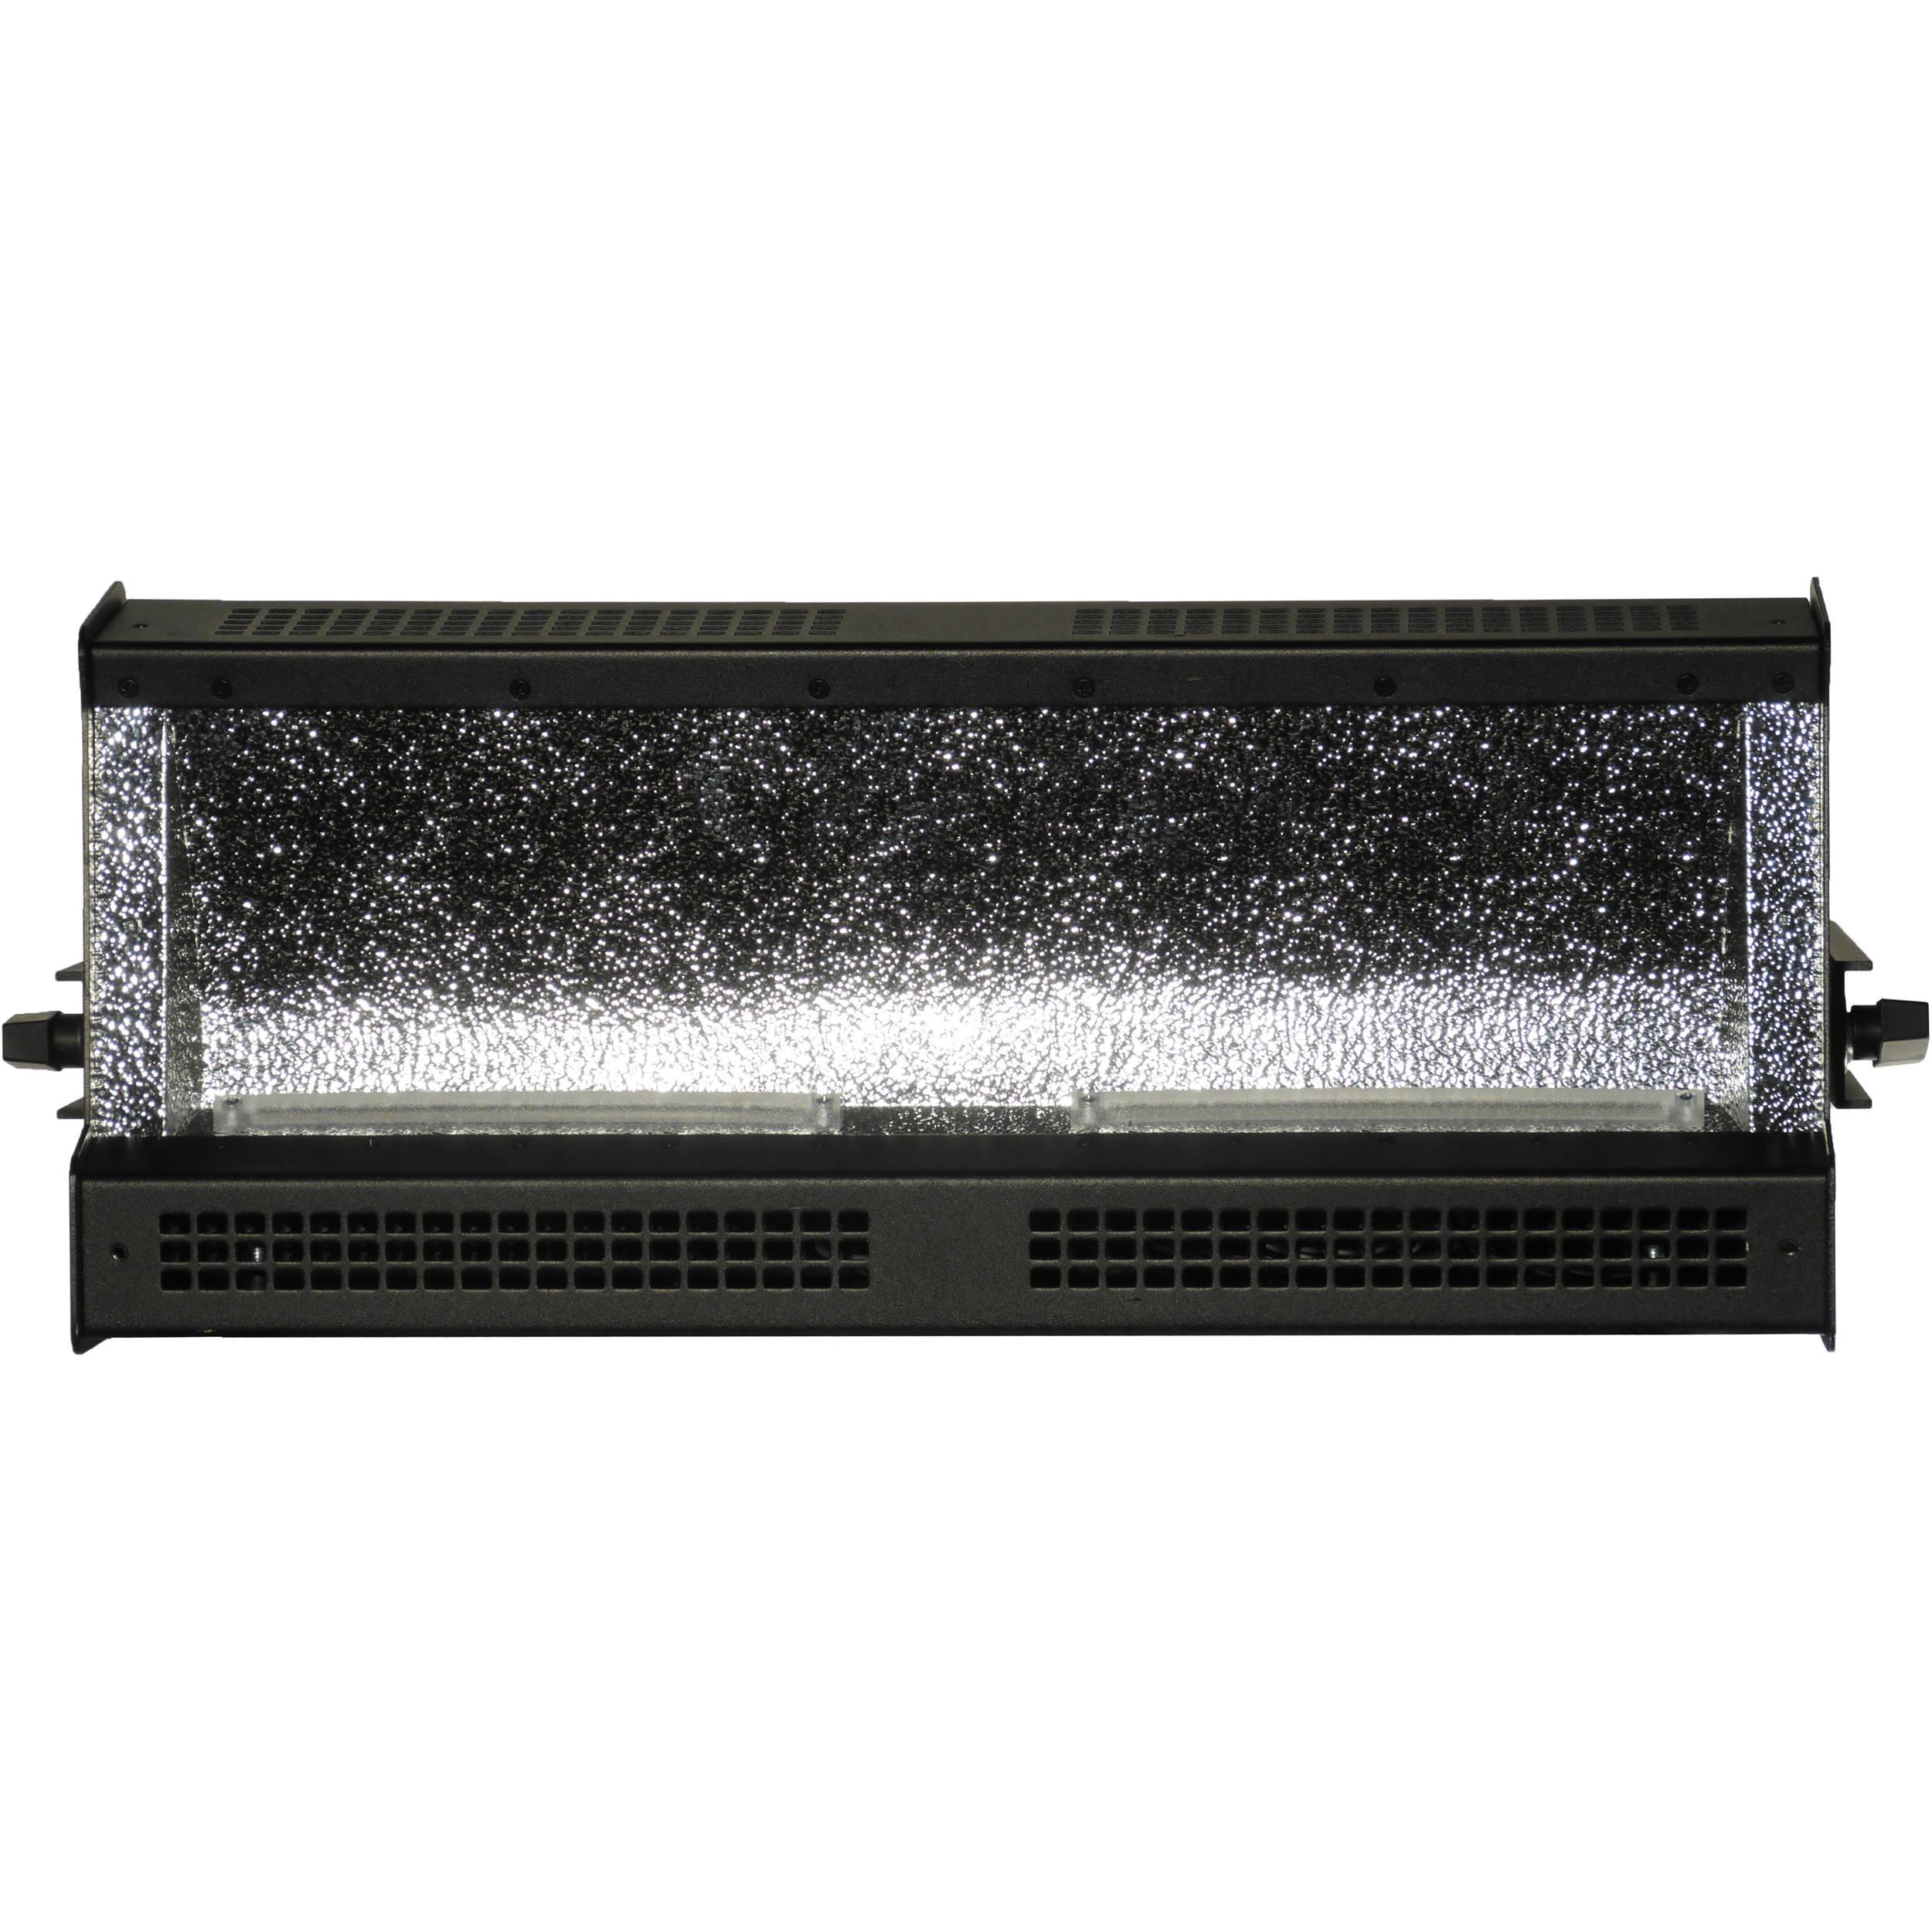 Altman Spectra Cyc 200 RGBA LED Wash Light SSCYC200-RGBA-B B&H